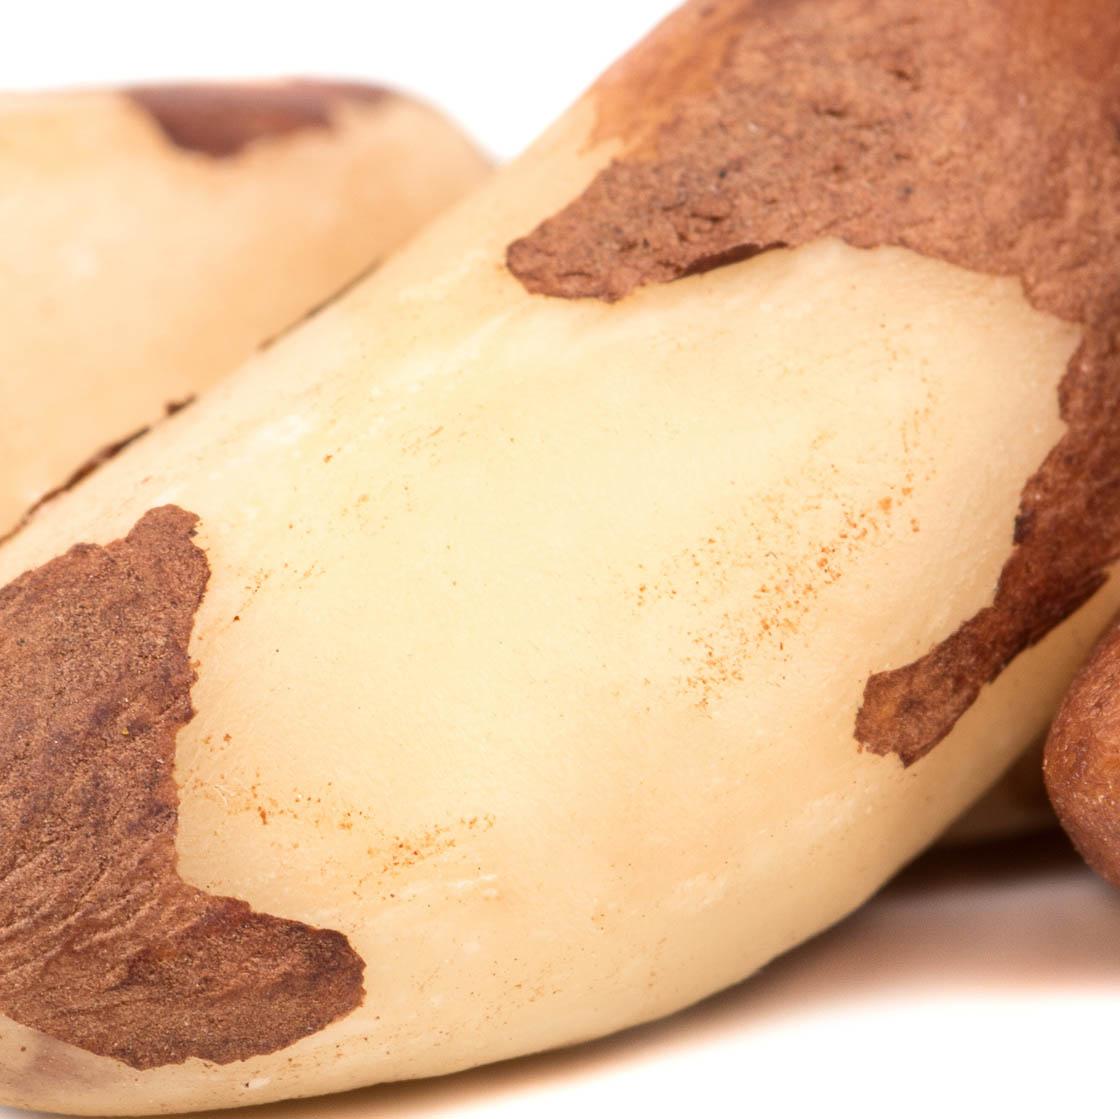 Brazil Nut (Organic)